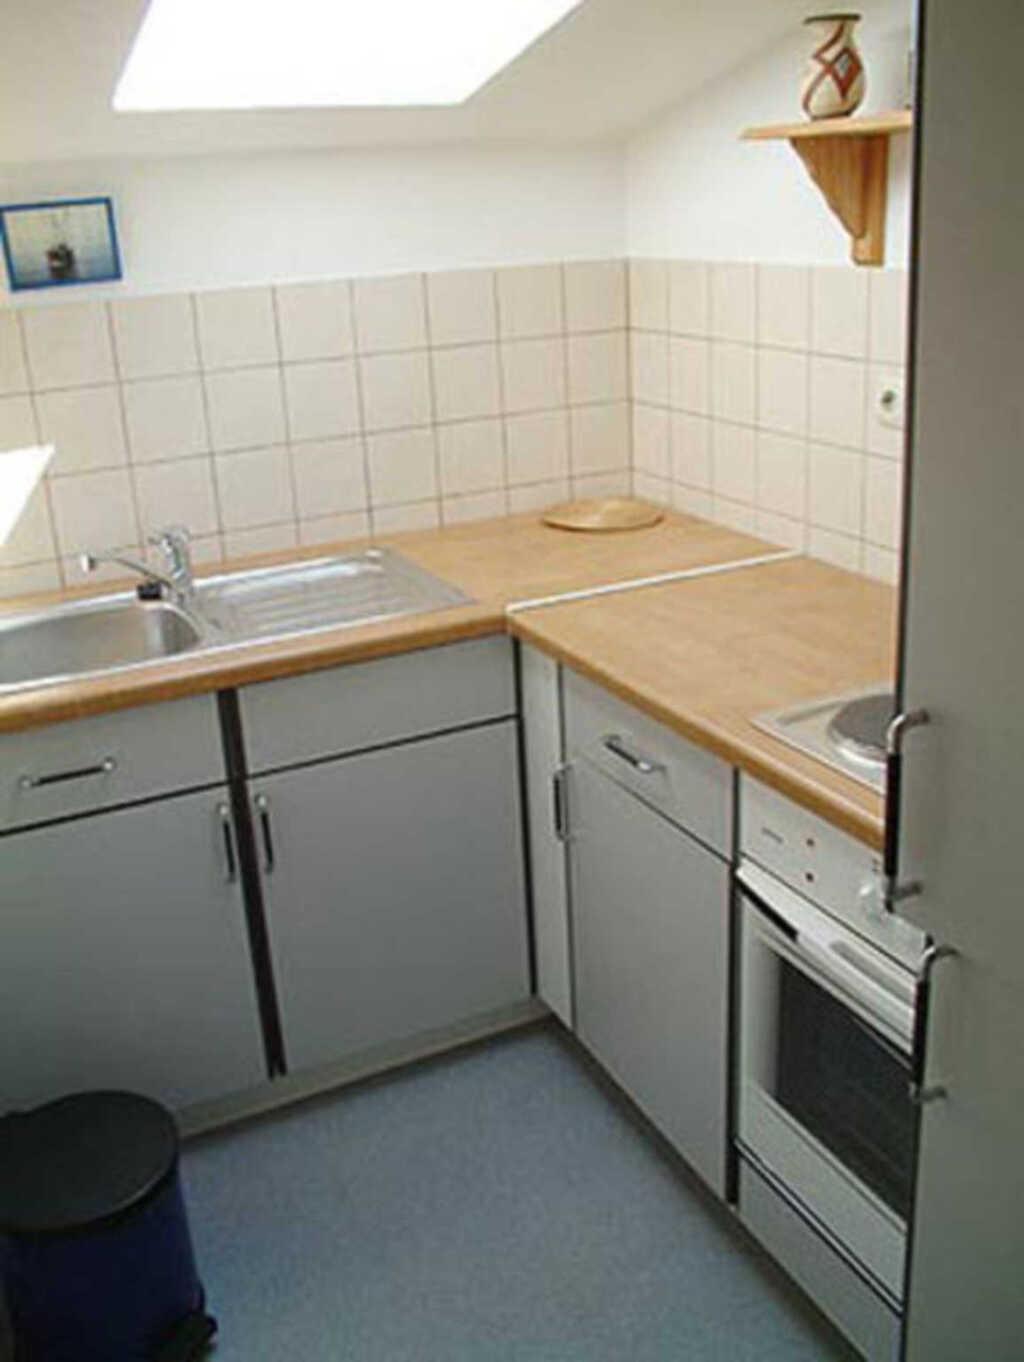 WAR - Haus Nicolae, App. 6 3-Raum Balk